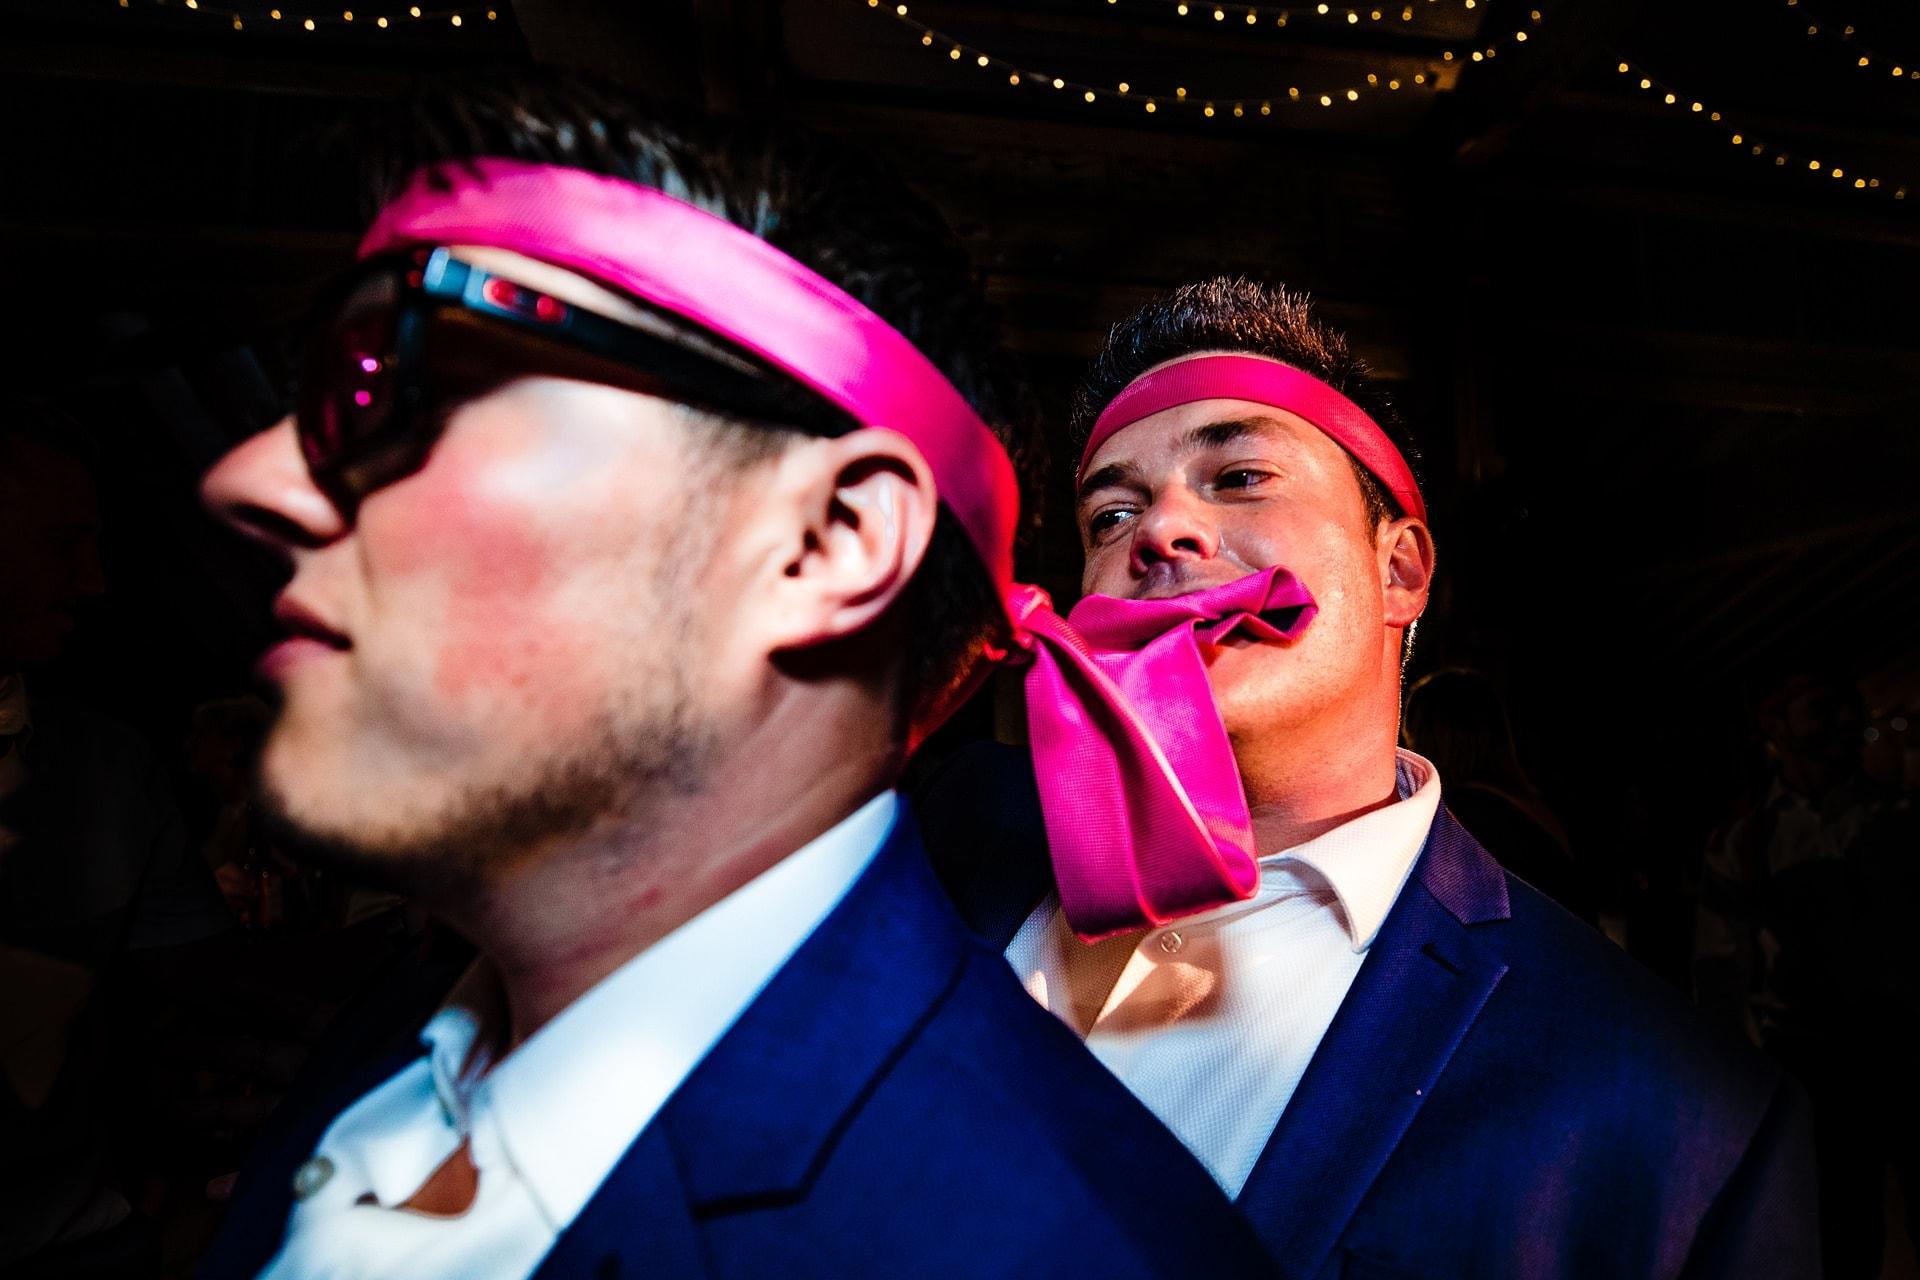 pink tie dance brothers